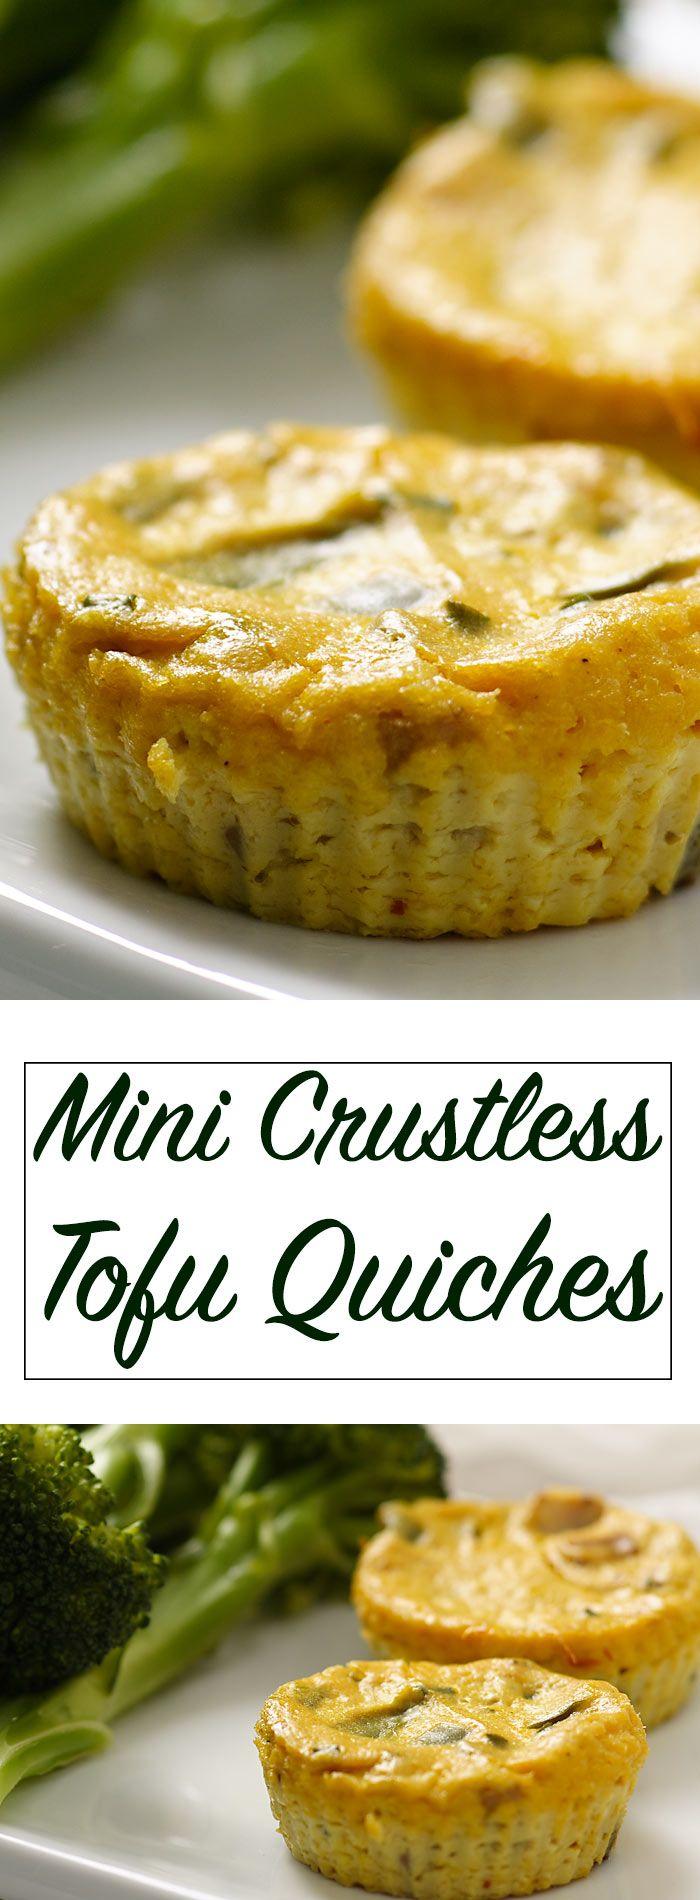 Mini Crustless Tofu Quiches Fatfree Vegan Kitchen Recipe Recipes Appetizers For Party Vegan Kitchen